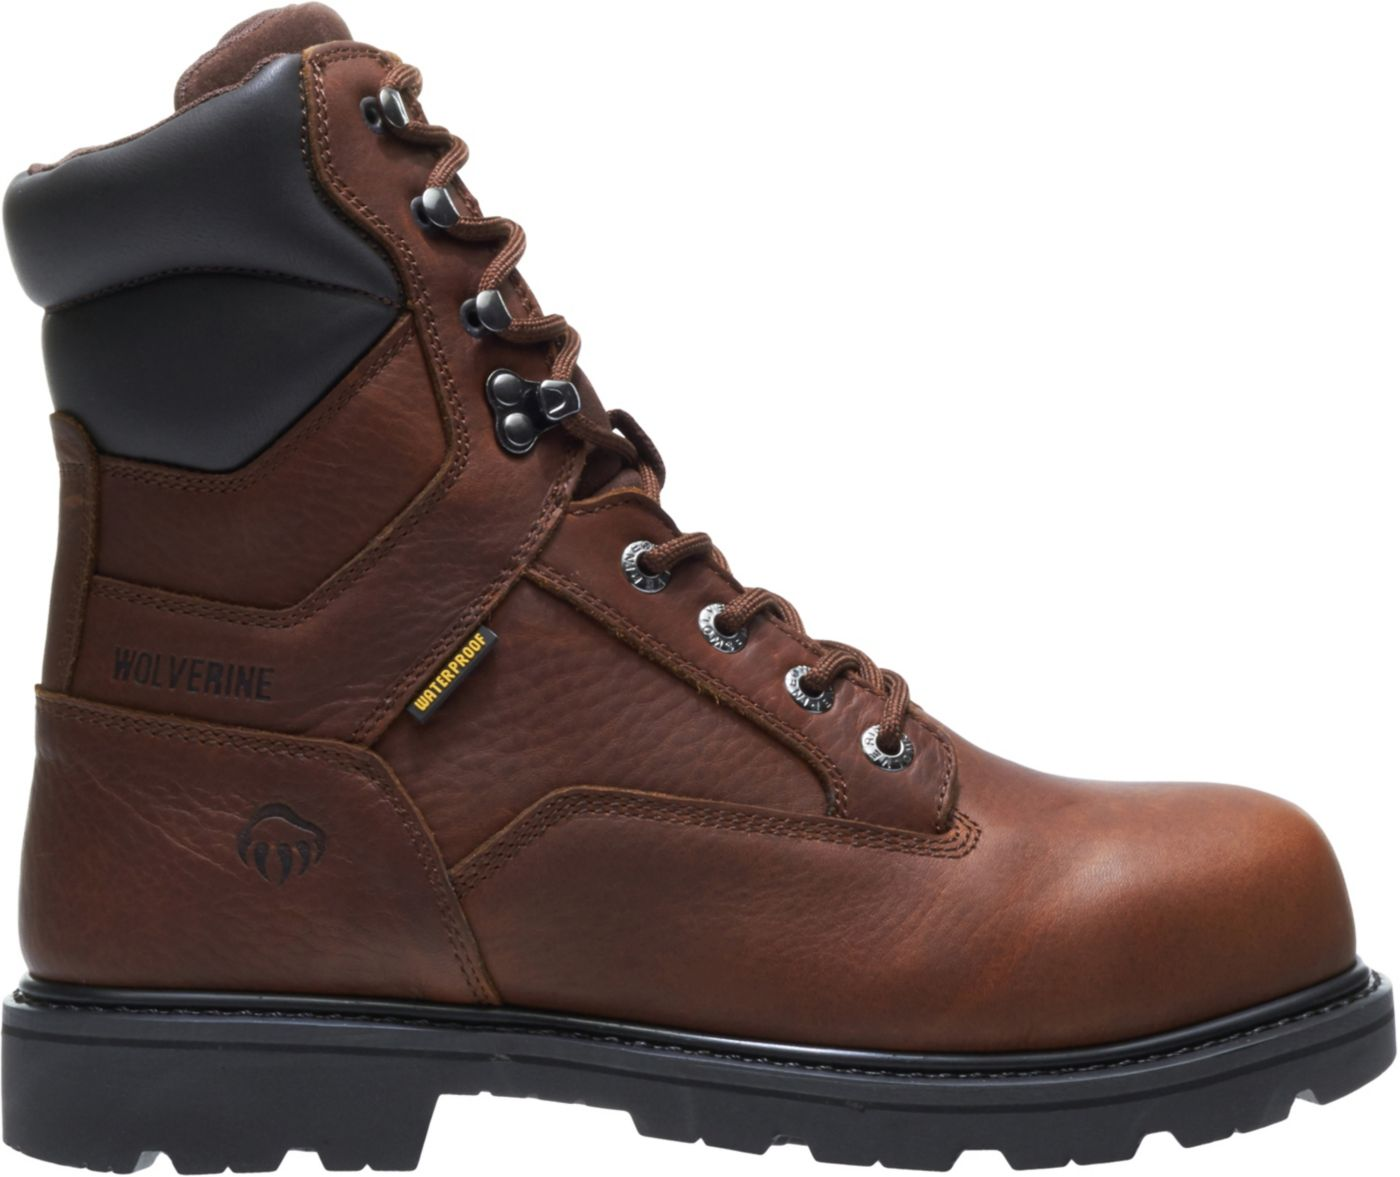 Wolverine Men's Farmhand 8'' Waterproof Work Boots